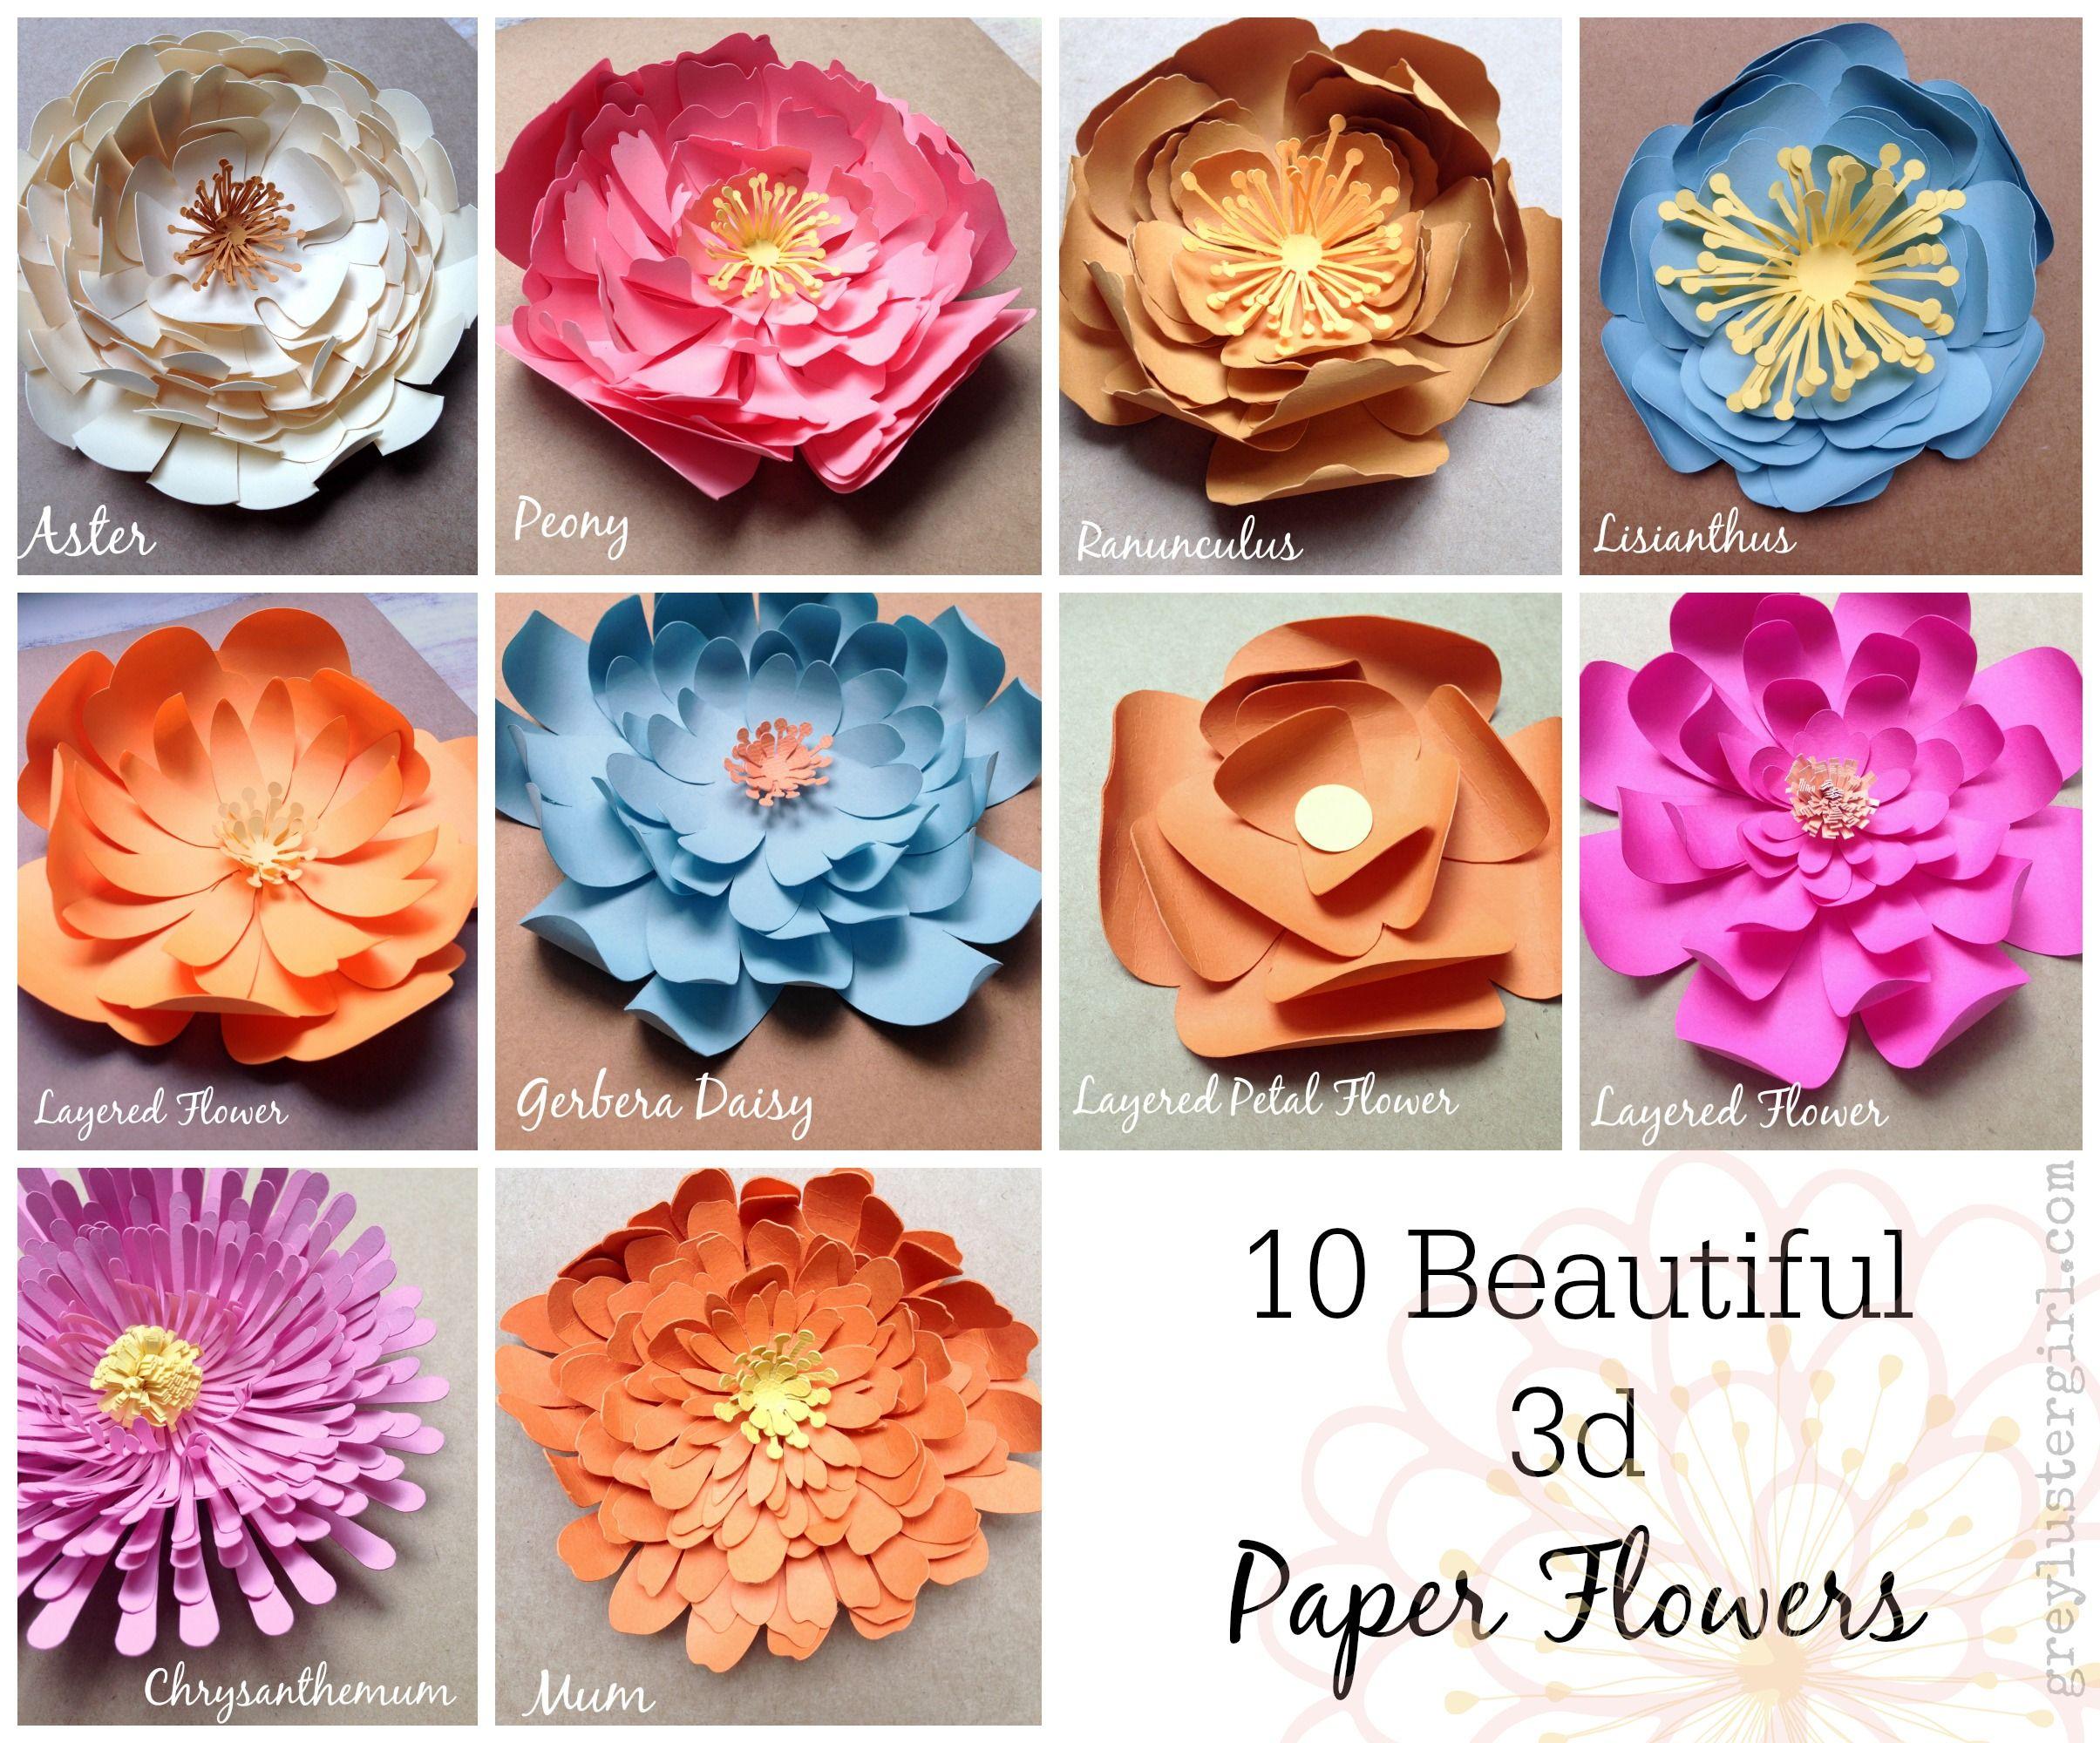 10 Beautiful 3d Paper Flowers Crafts Pinterest Paper Flowers